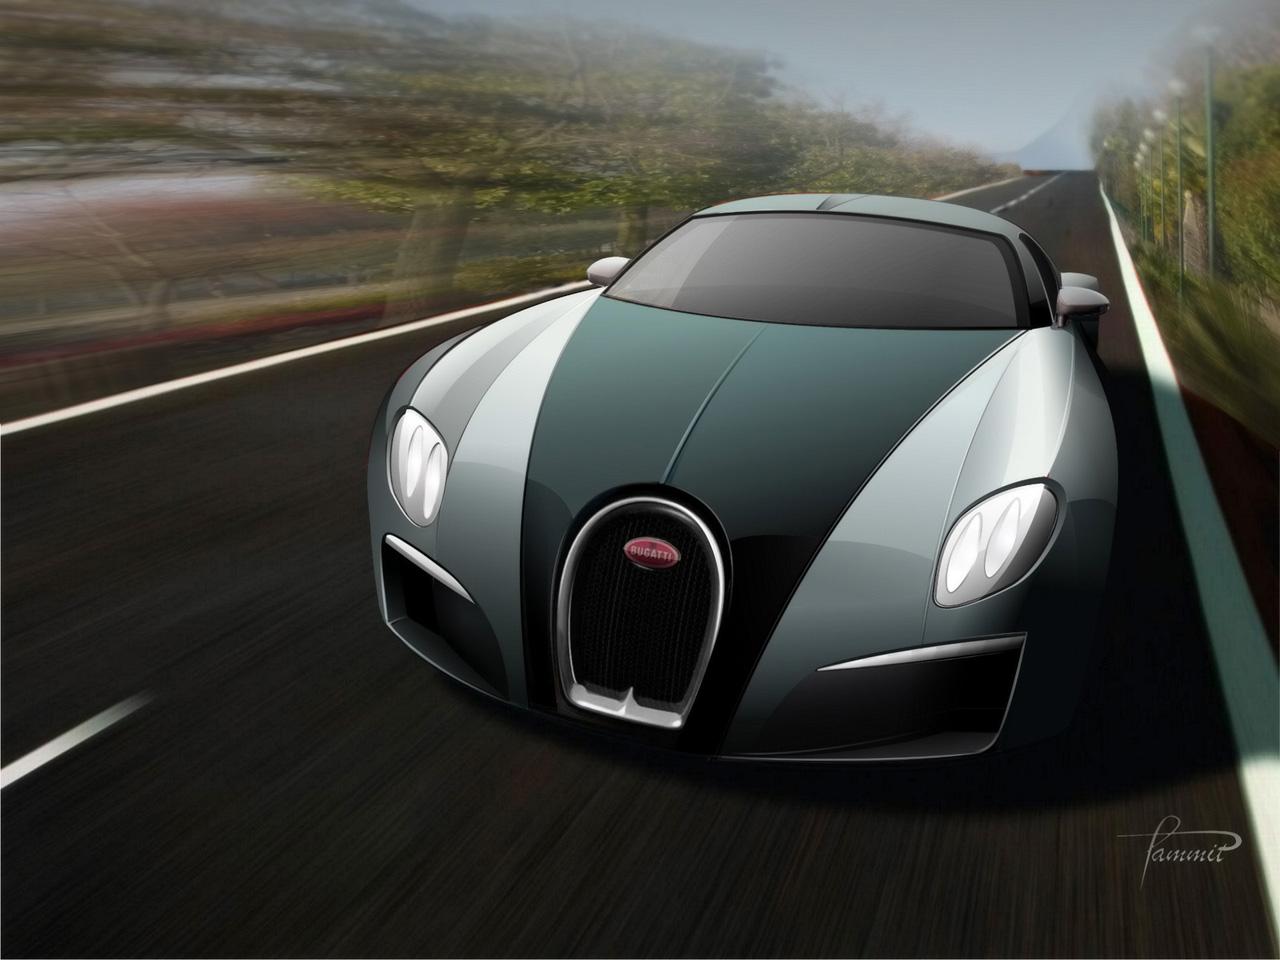 http://2.bp.blogspot.com/-PiDTxEFQ7FE/Ti1gsAvxhkI/AAAAAAAAInY/2fPKwuiHd8o/s1600/Bugatti+Type+12-2+Streamliner+Car+Wallpapers+1.jpg